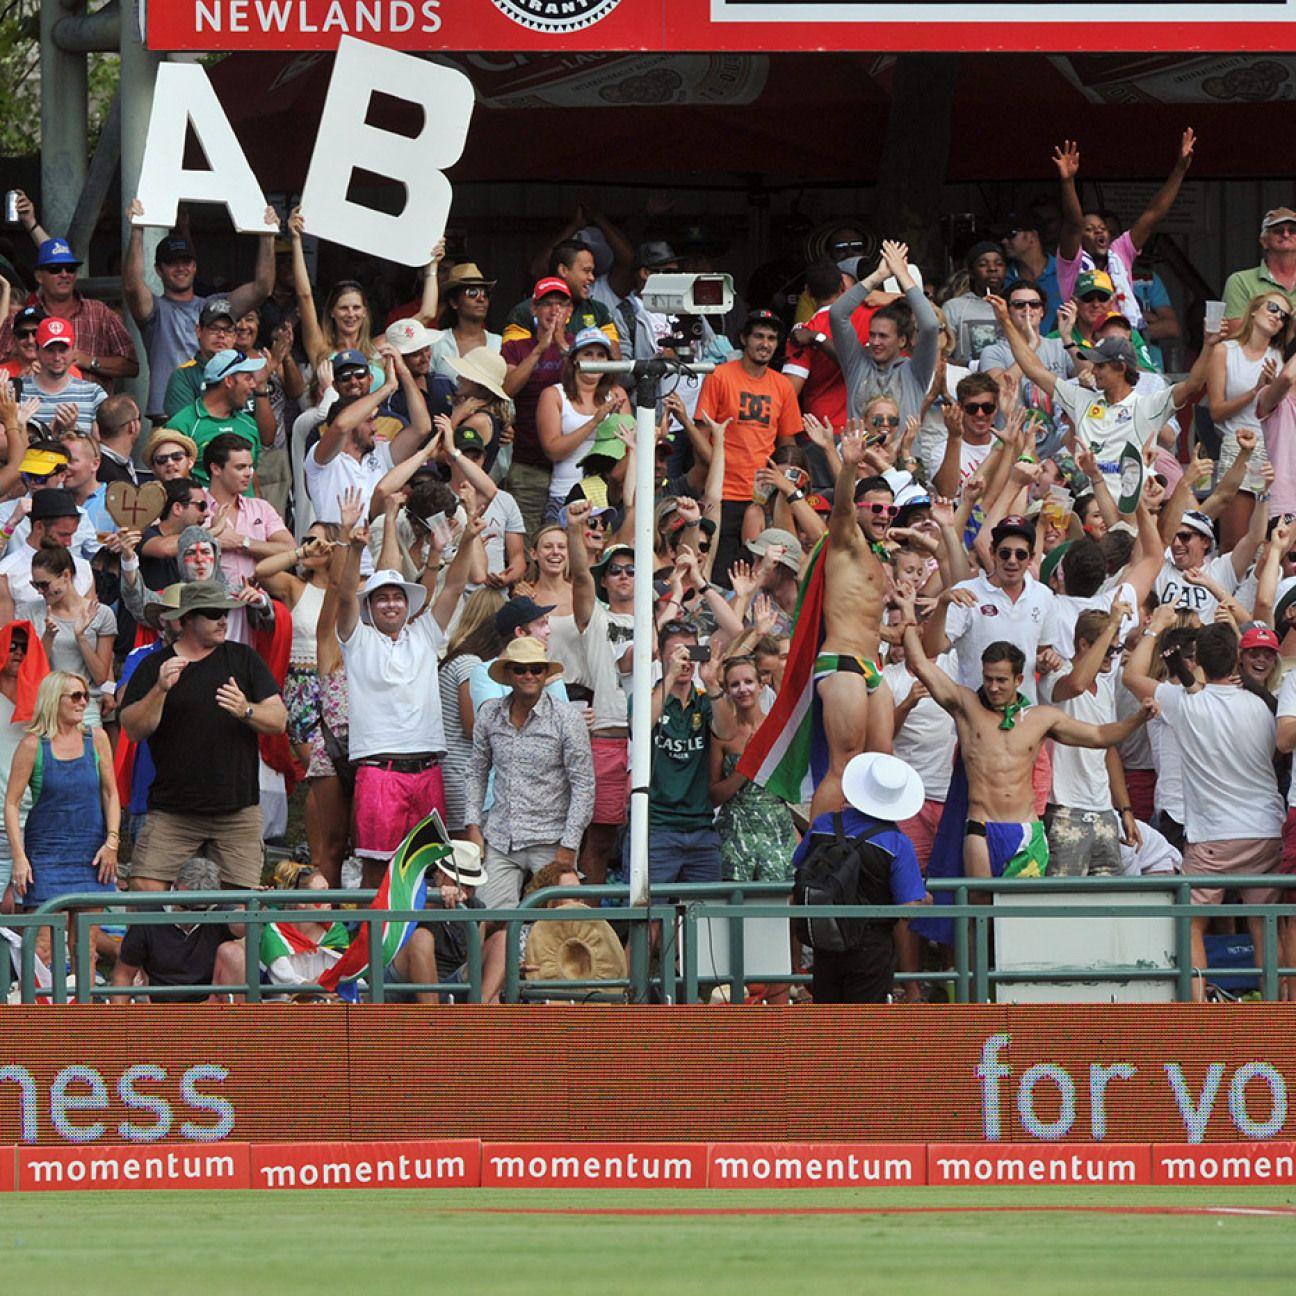 South Africa opens borders but international sport remains locked down | ESPNcricinfo.com - ESPNcricinfo